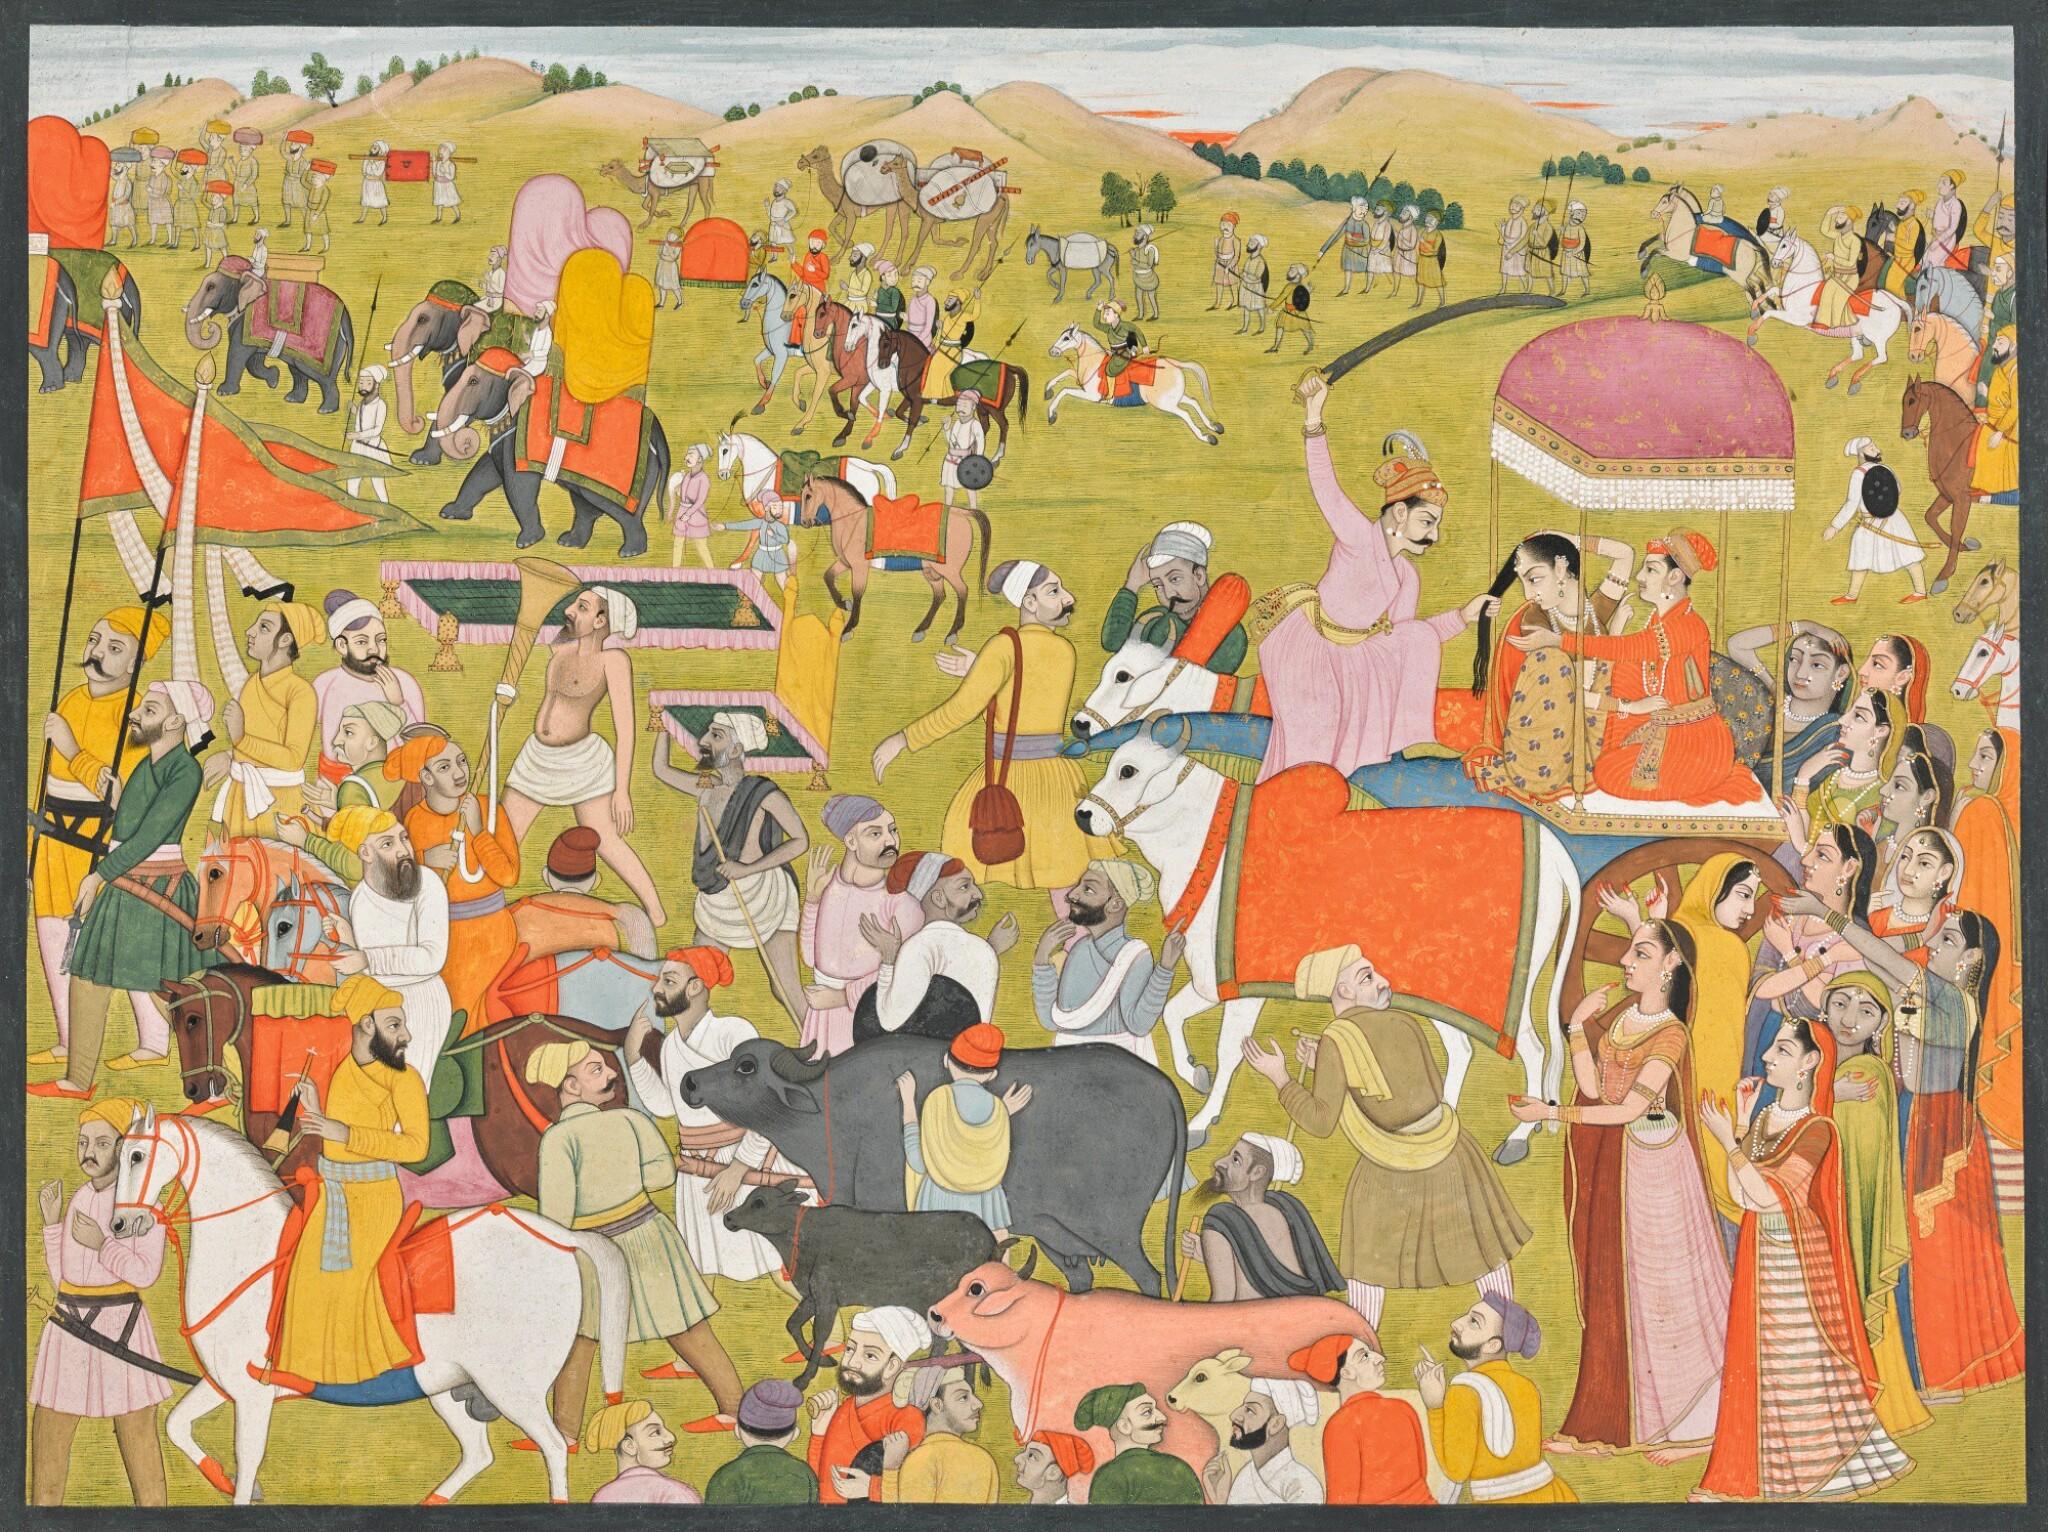 View full screen - View 1 of Lot 186. AN ILLUSTRATION TO THE BHAGAVATA PURANA: KAMSA ATTACKS DEVAKI DURING HER WEDDING PROCESSION, ATTRIBUTED TO A MASTER OF THE FIRST GENERATION AFTER NAINSUKH, INDIA, PAHARI, GULER OR KANGRA, CIRCA 1780.